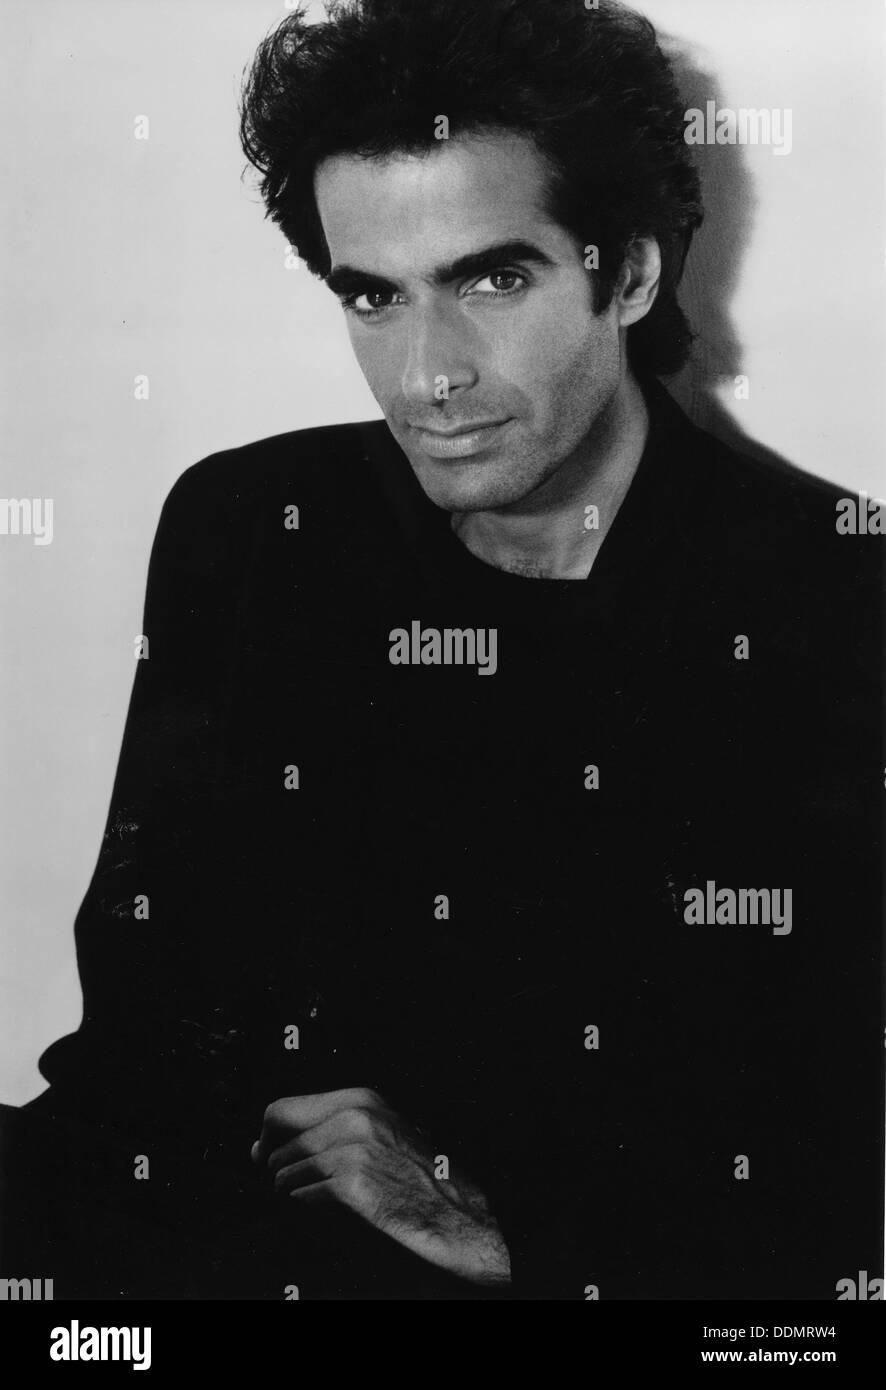 David Copperfield (1956- ), American Illusionist, 1994. Stock Photo